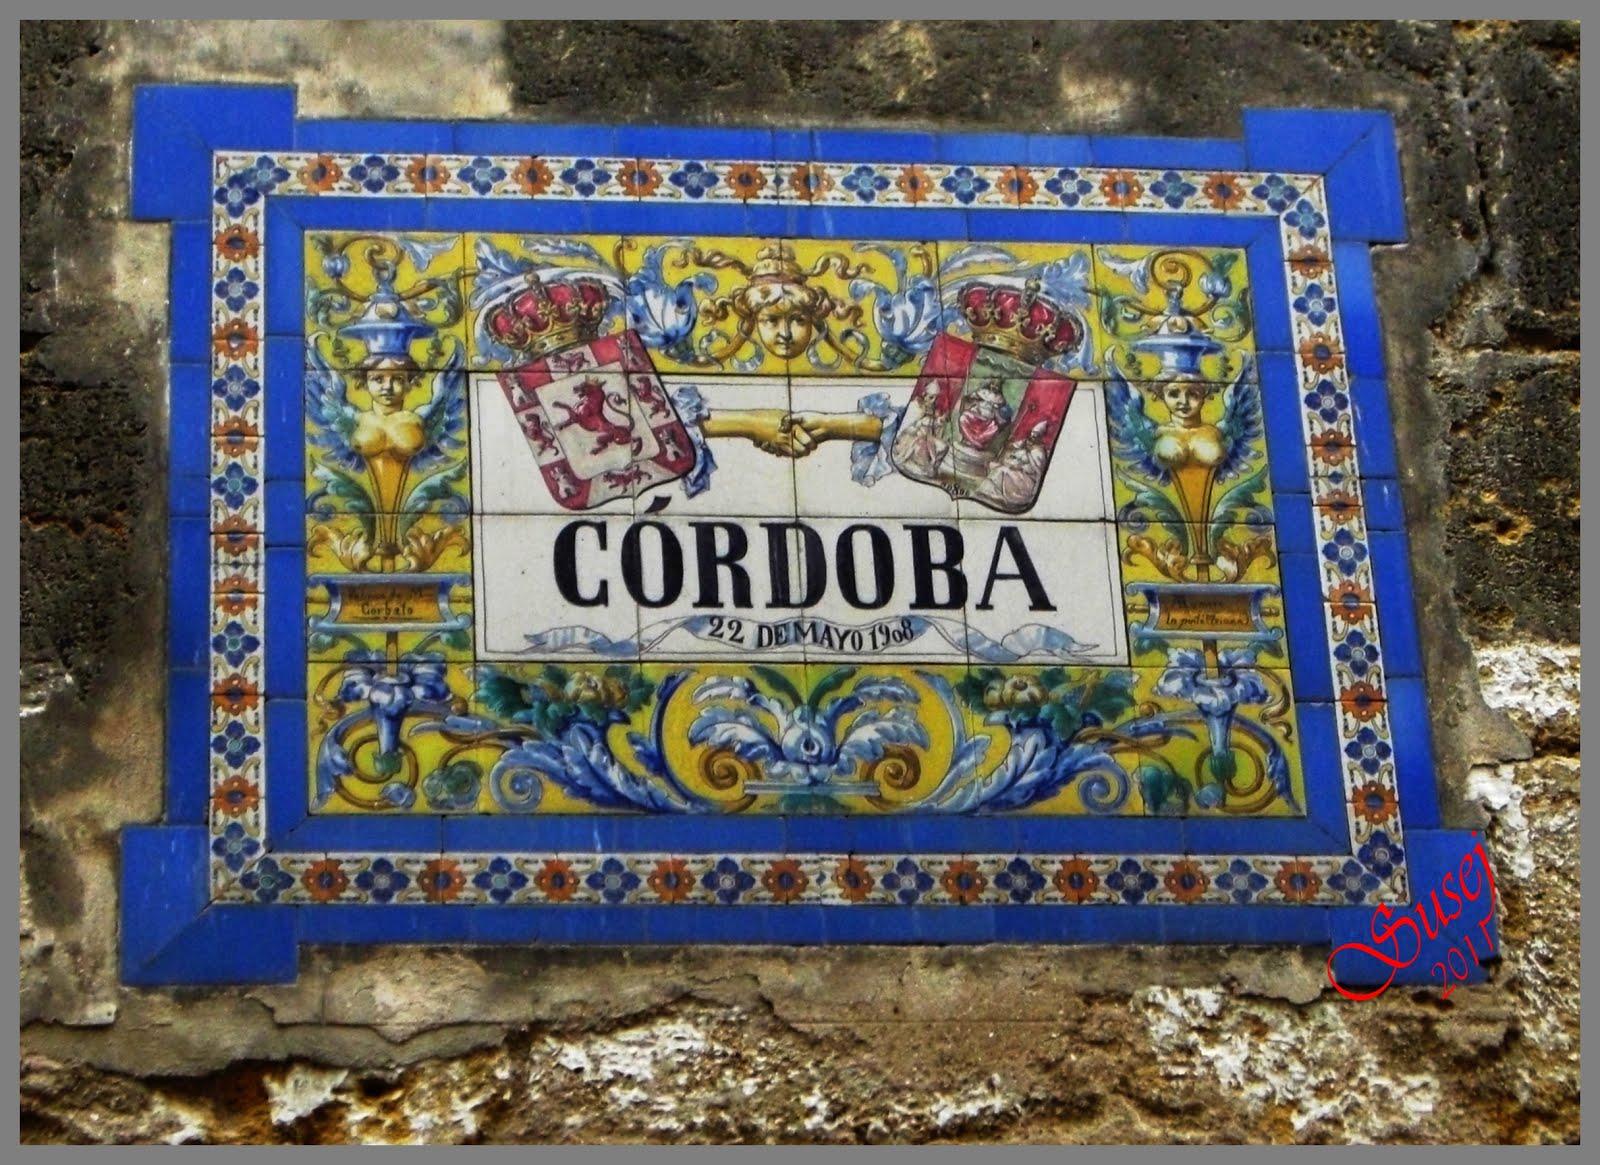 La lata de membrillo azulejos en la calle for Azulejos cordoba